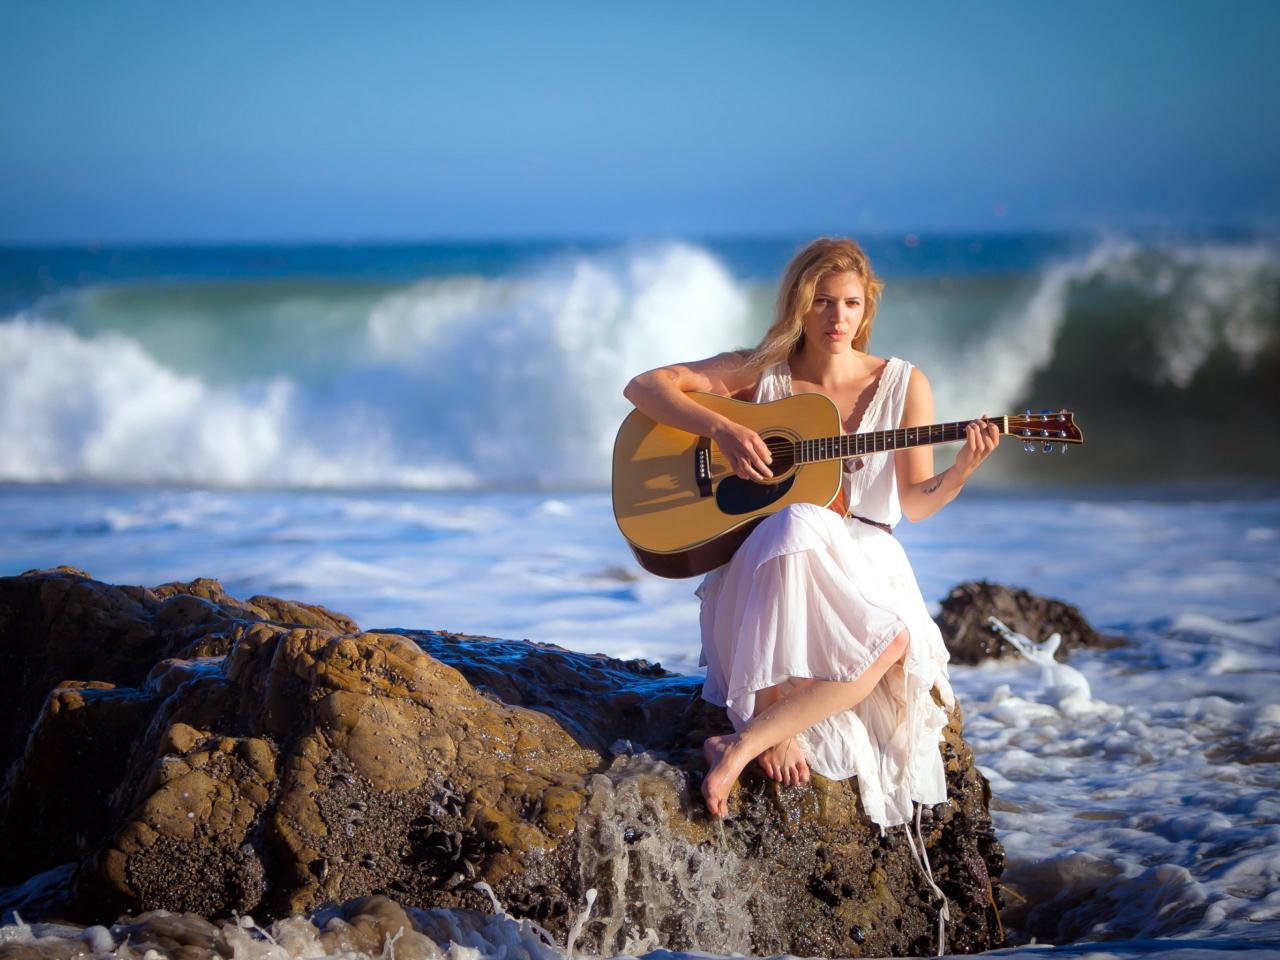 https://f.vividscreen.info/soft/aae7da49f696f426178d31cc00db3b5a/Girl-Waves-Music-1280x960.jpg